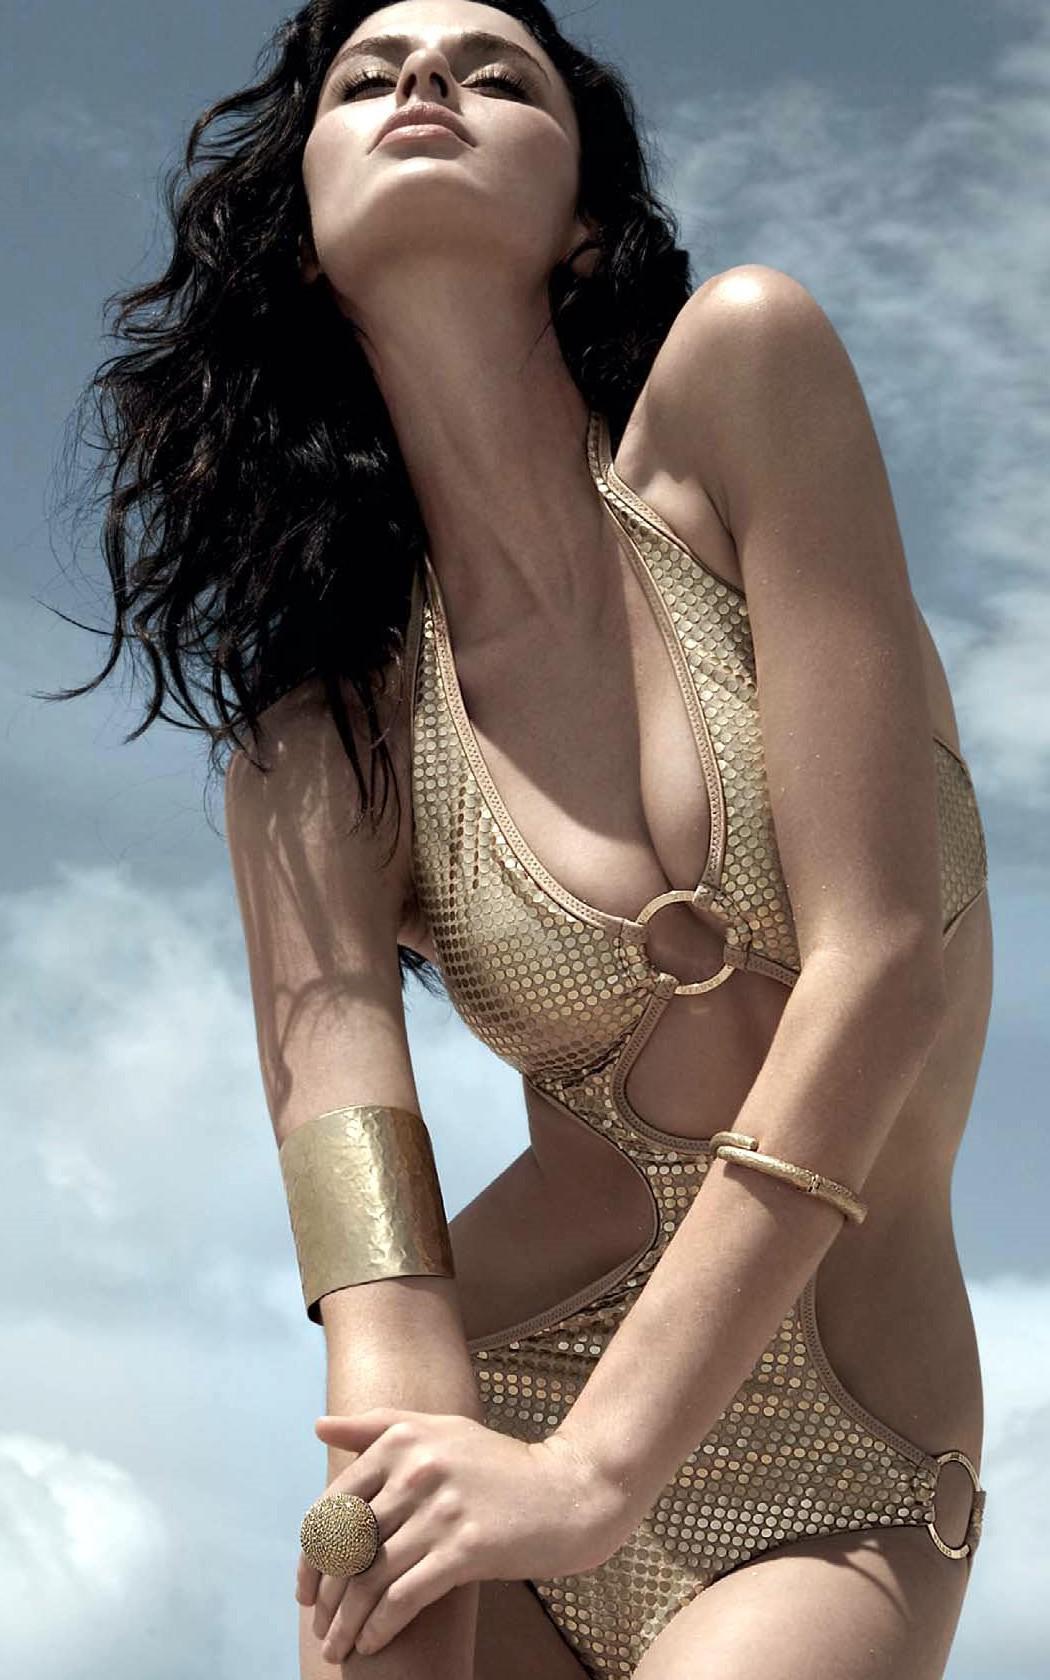 Les Stars Nues : Nicole Trunfio - 297 photos - 0 vidos